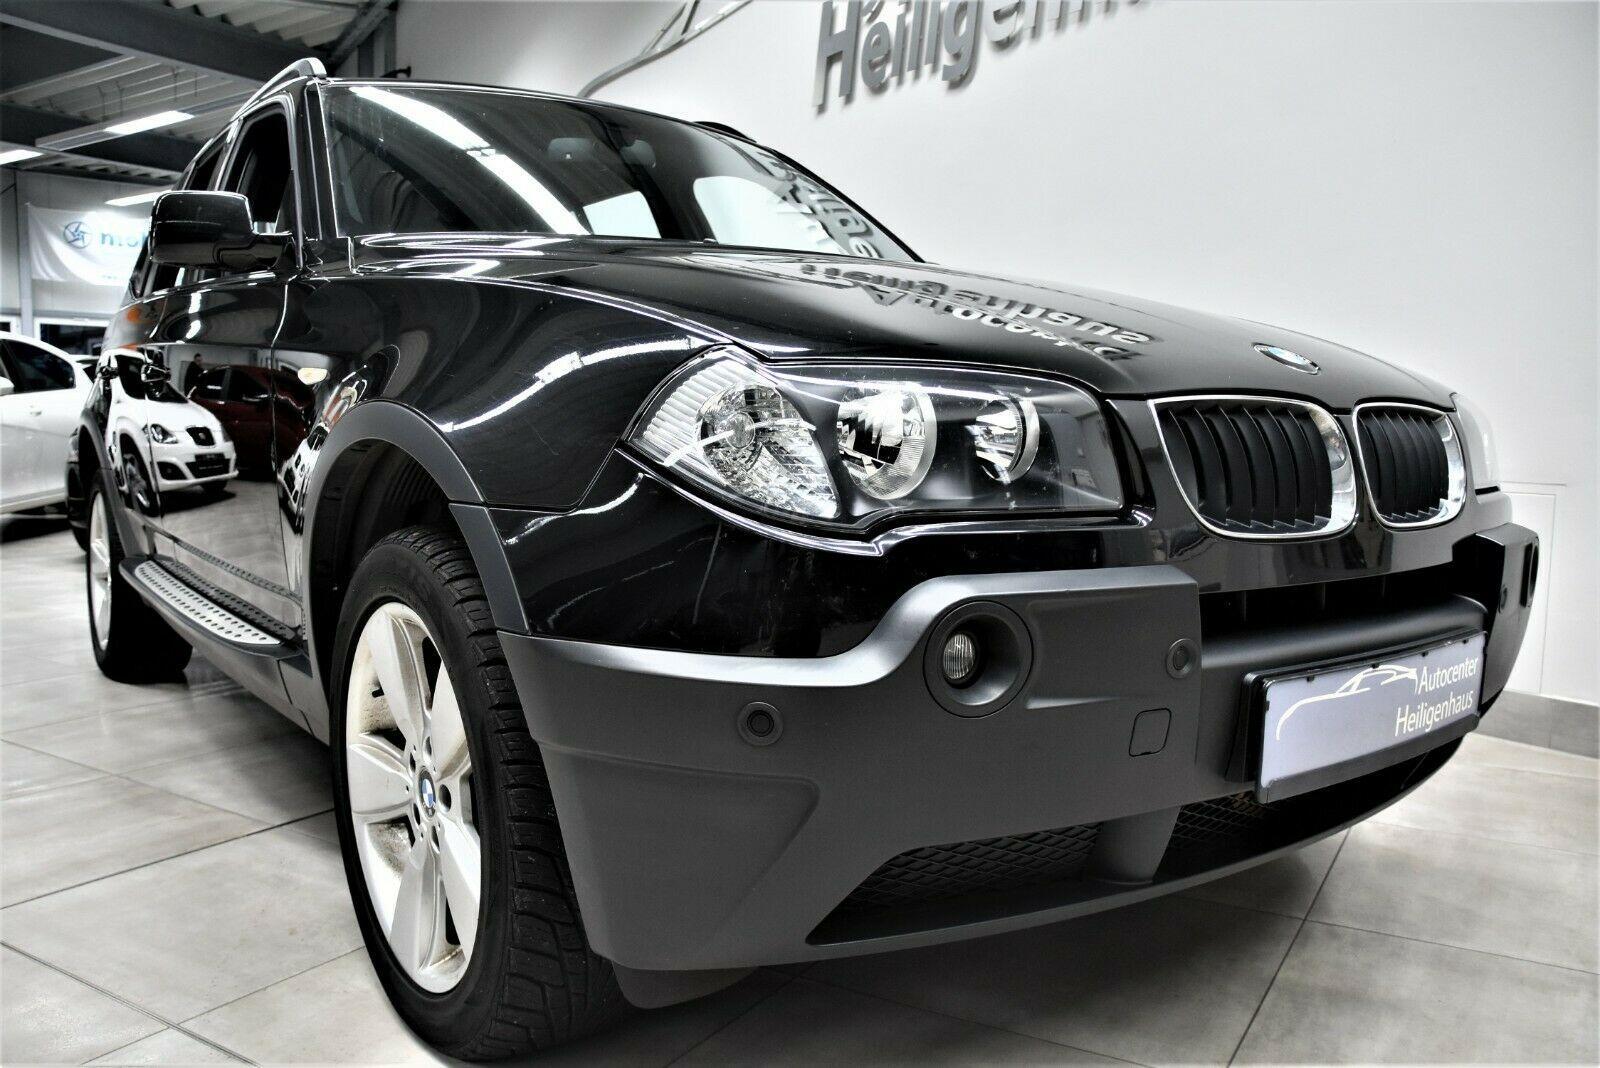 BMW X3 2.0d Navi Klima Tempomat Sitzheizung 2.Hd PDC